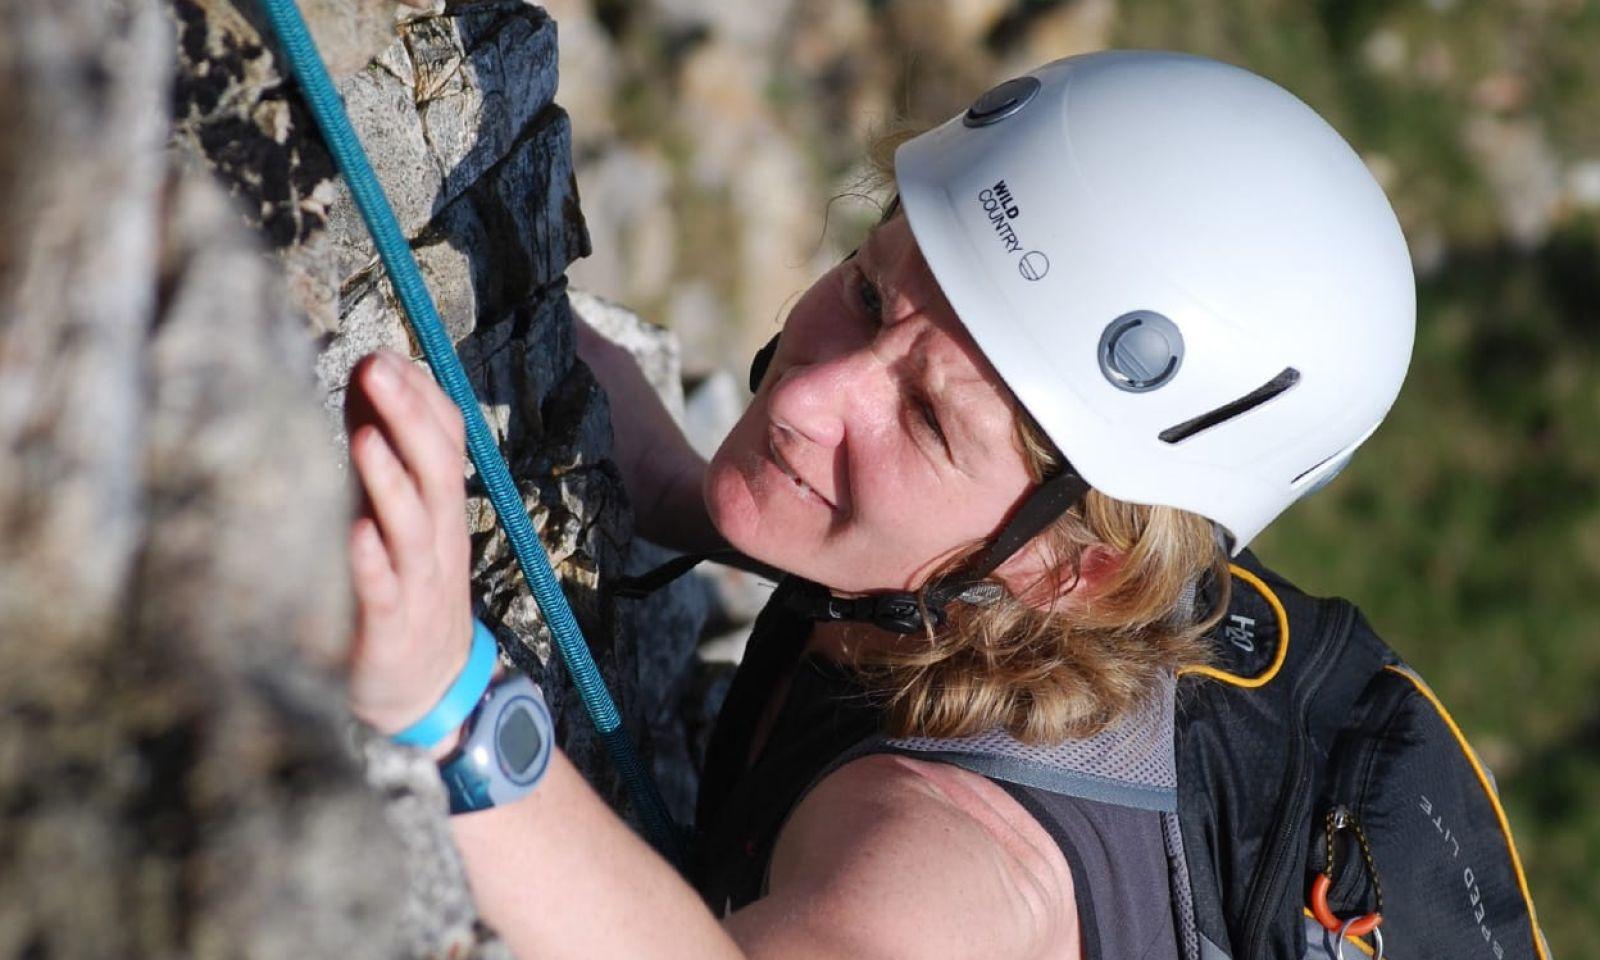 Lady wearing white climbing helmet climbing on rock